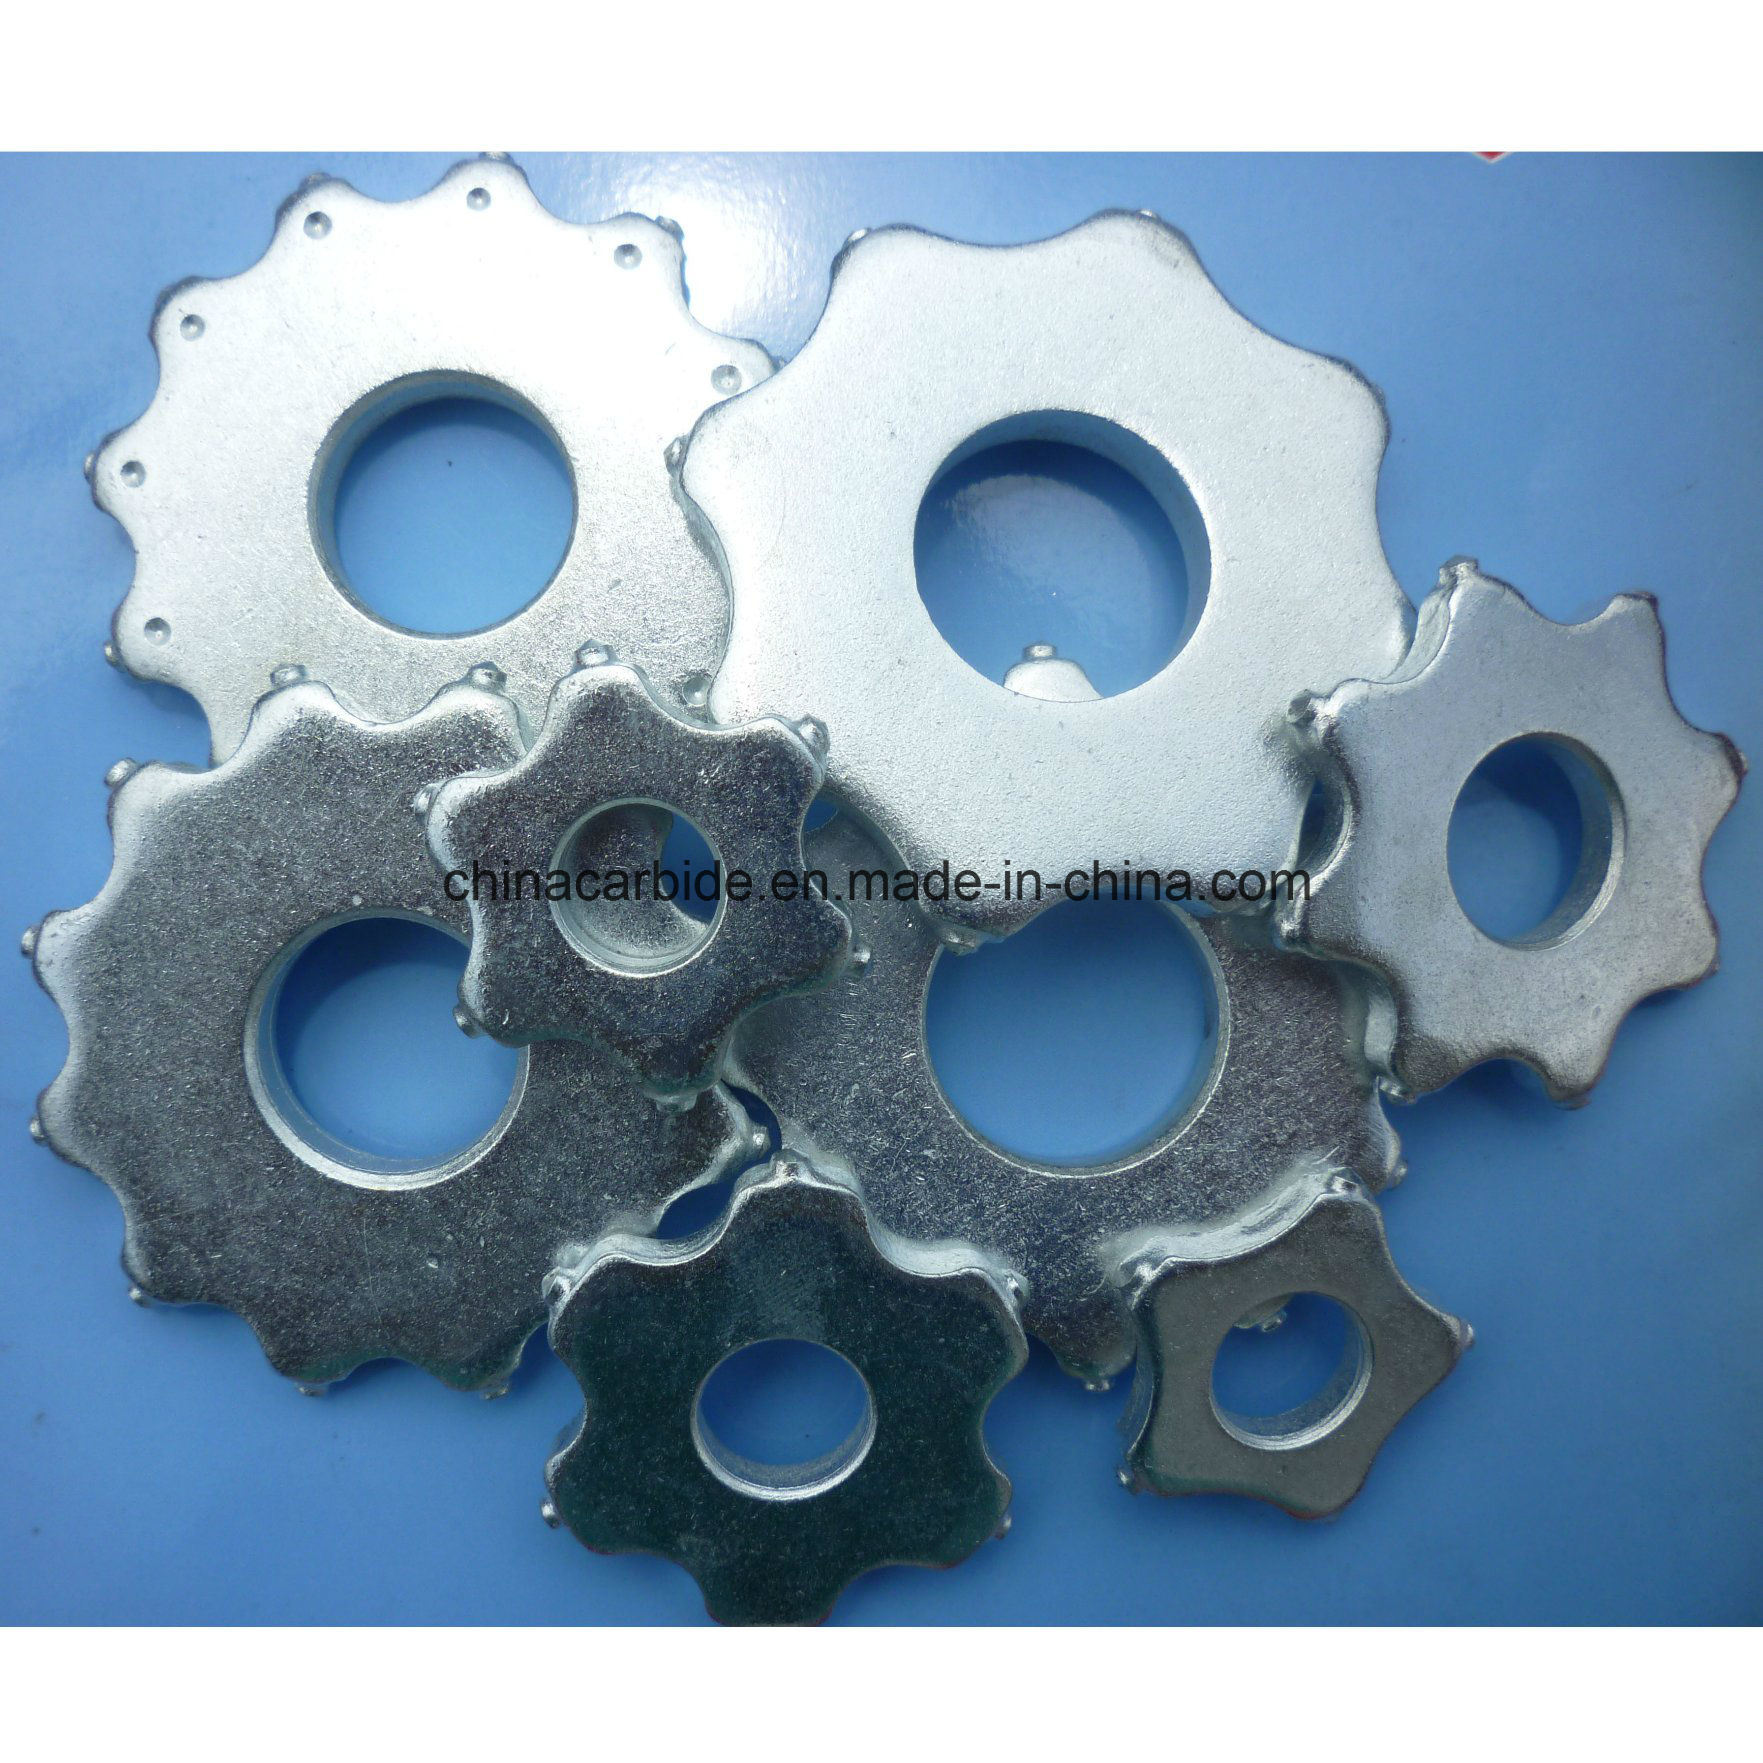 Tungsten Carbide Cutters for Concrete Scarifier